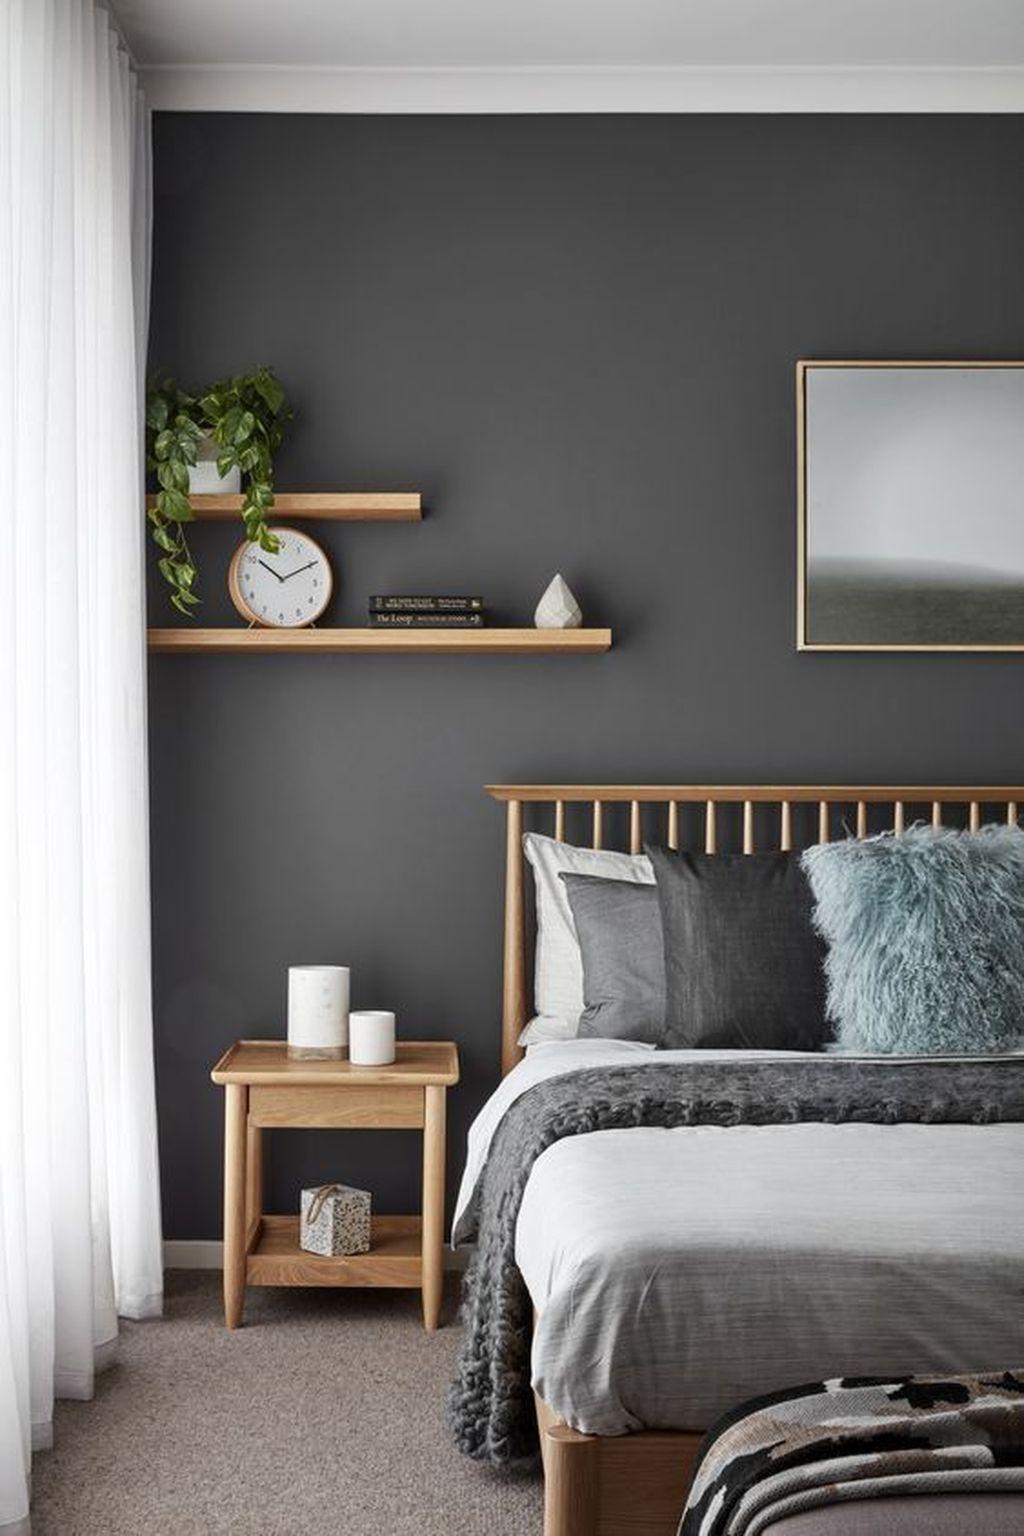 36 Amazing Small Bedroom Decor Ideas To Make Feel Bigger In 2020